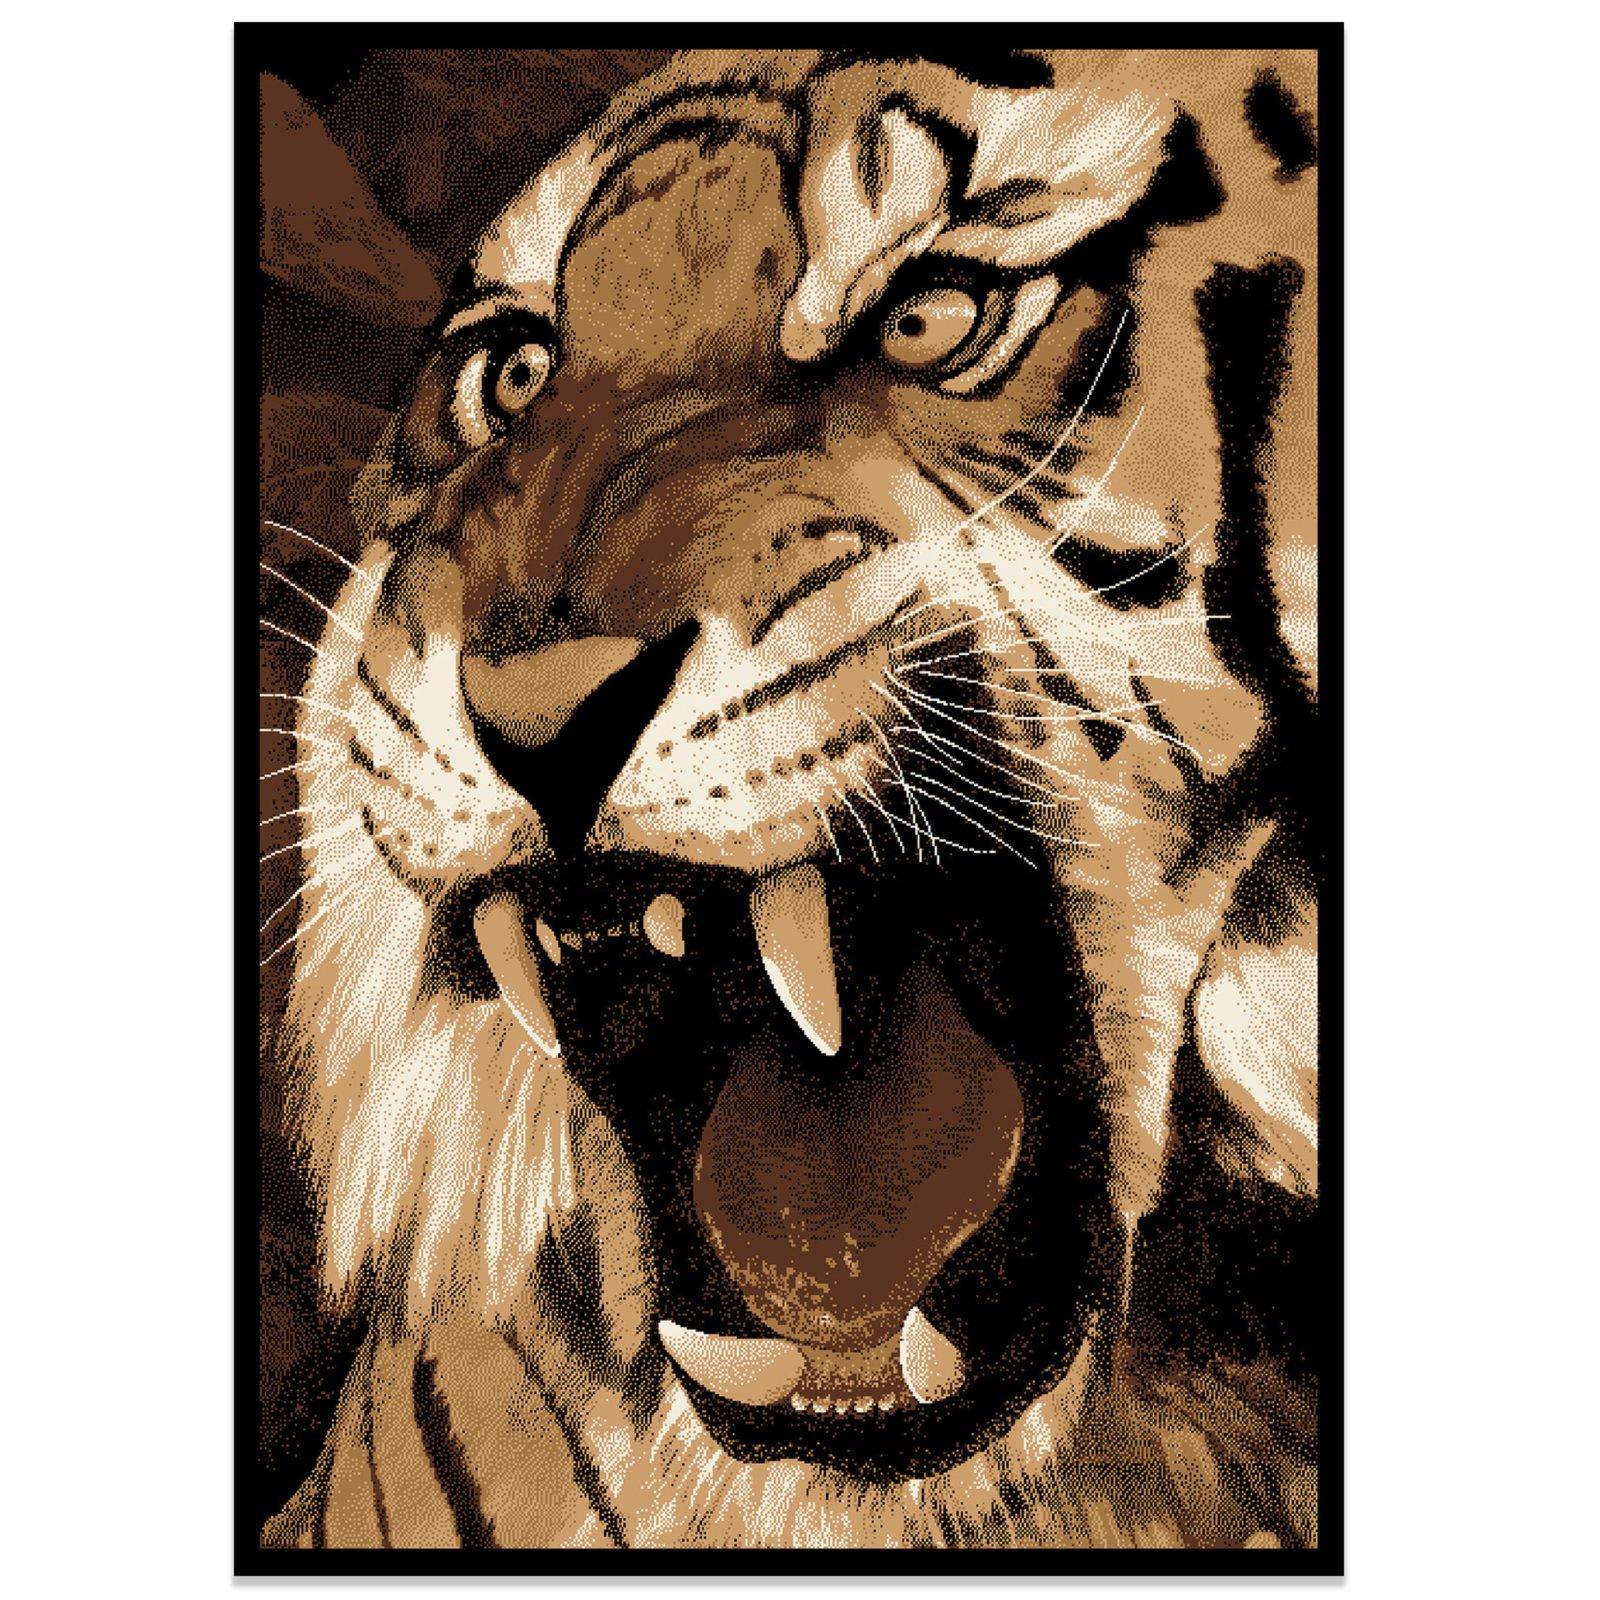 Teppich AFRIKA  braunschwarz  Tiger  160×225 cm